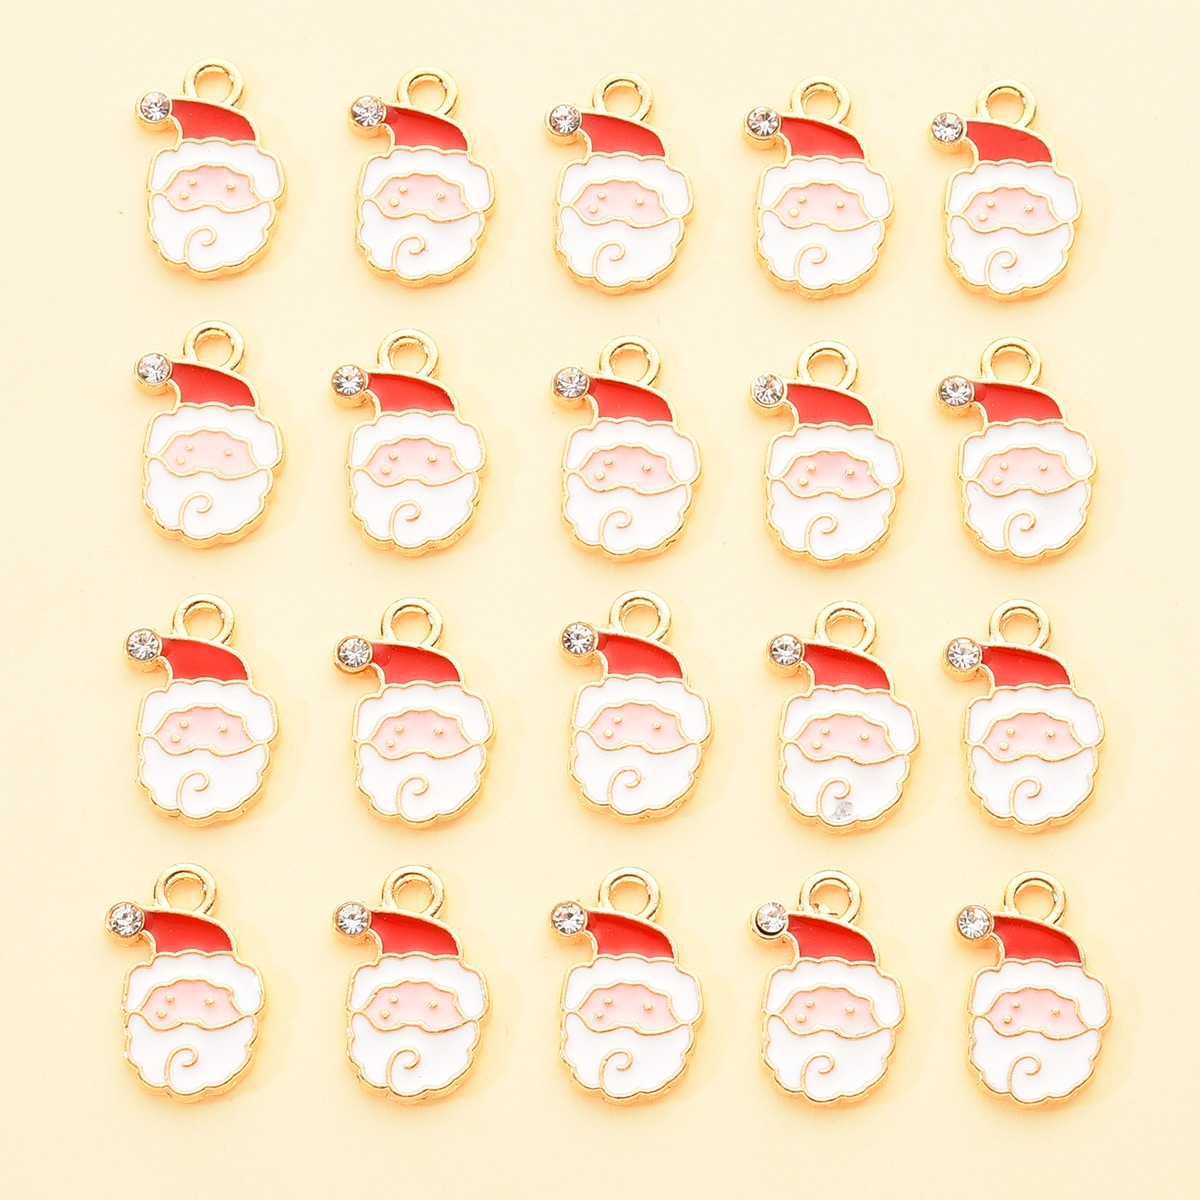 20шт рождественский со стразами санта-клаус подвеска